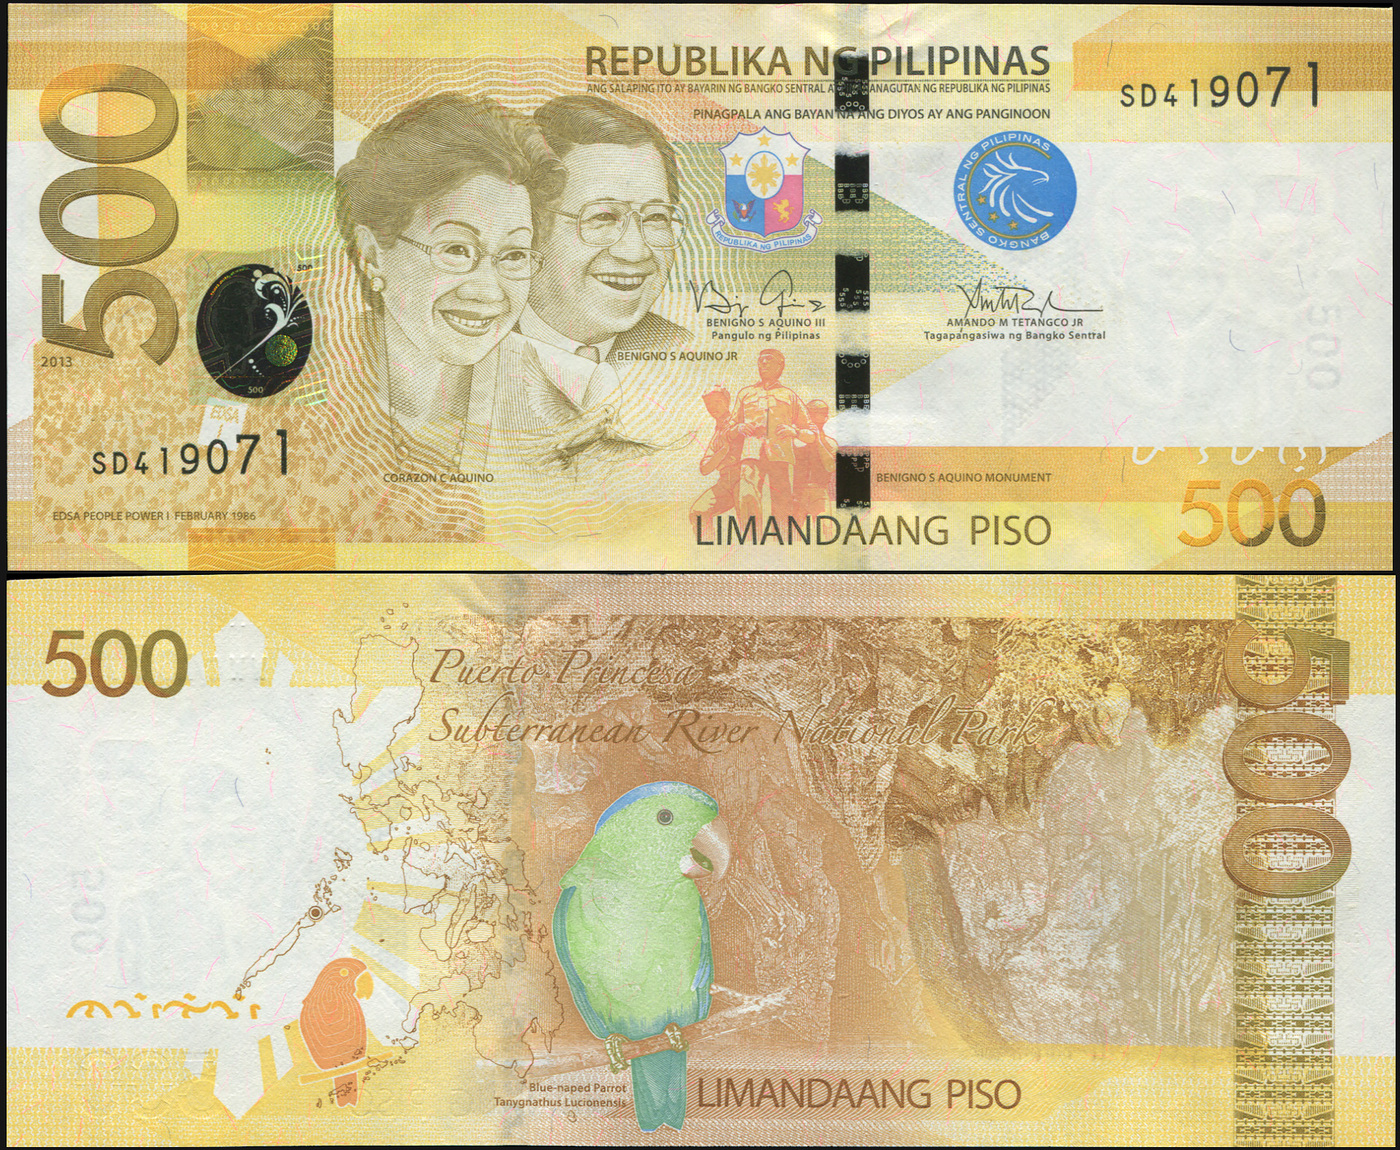 валюта стран мира фото с названием на русском основе монтажа любого